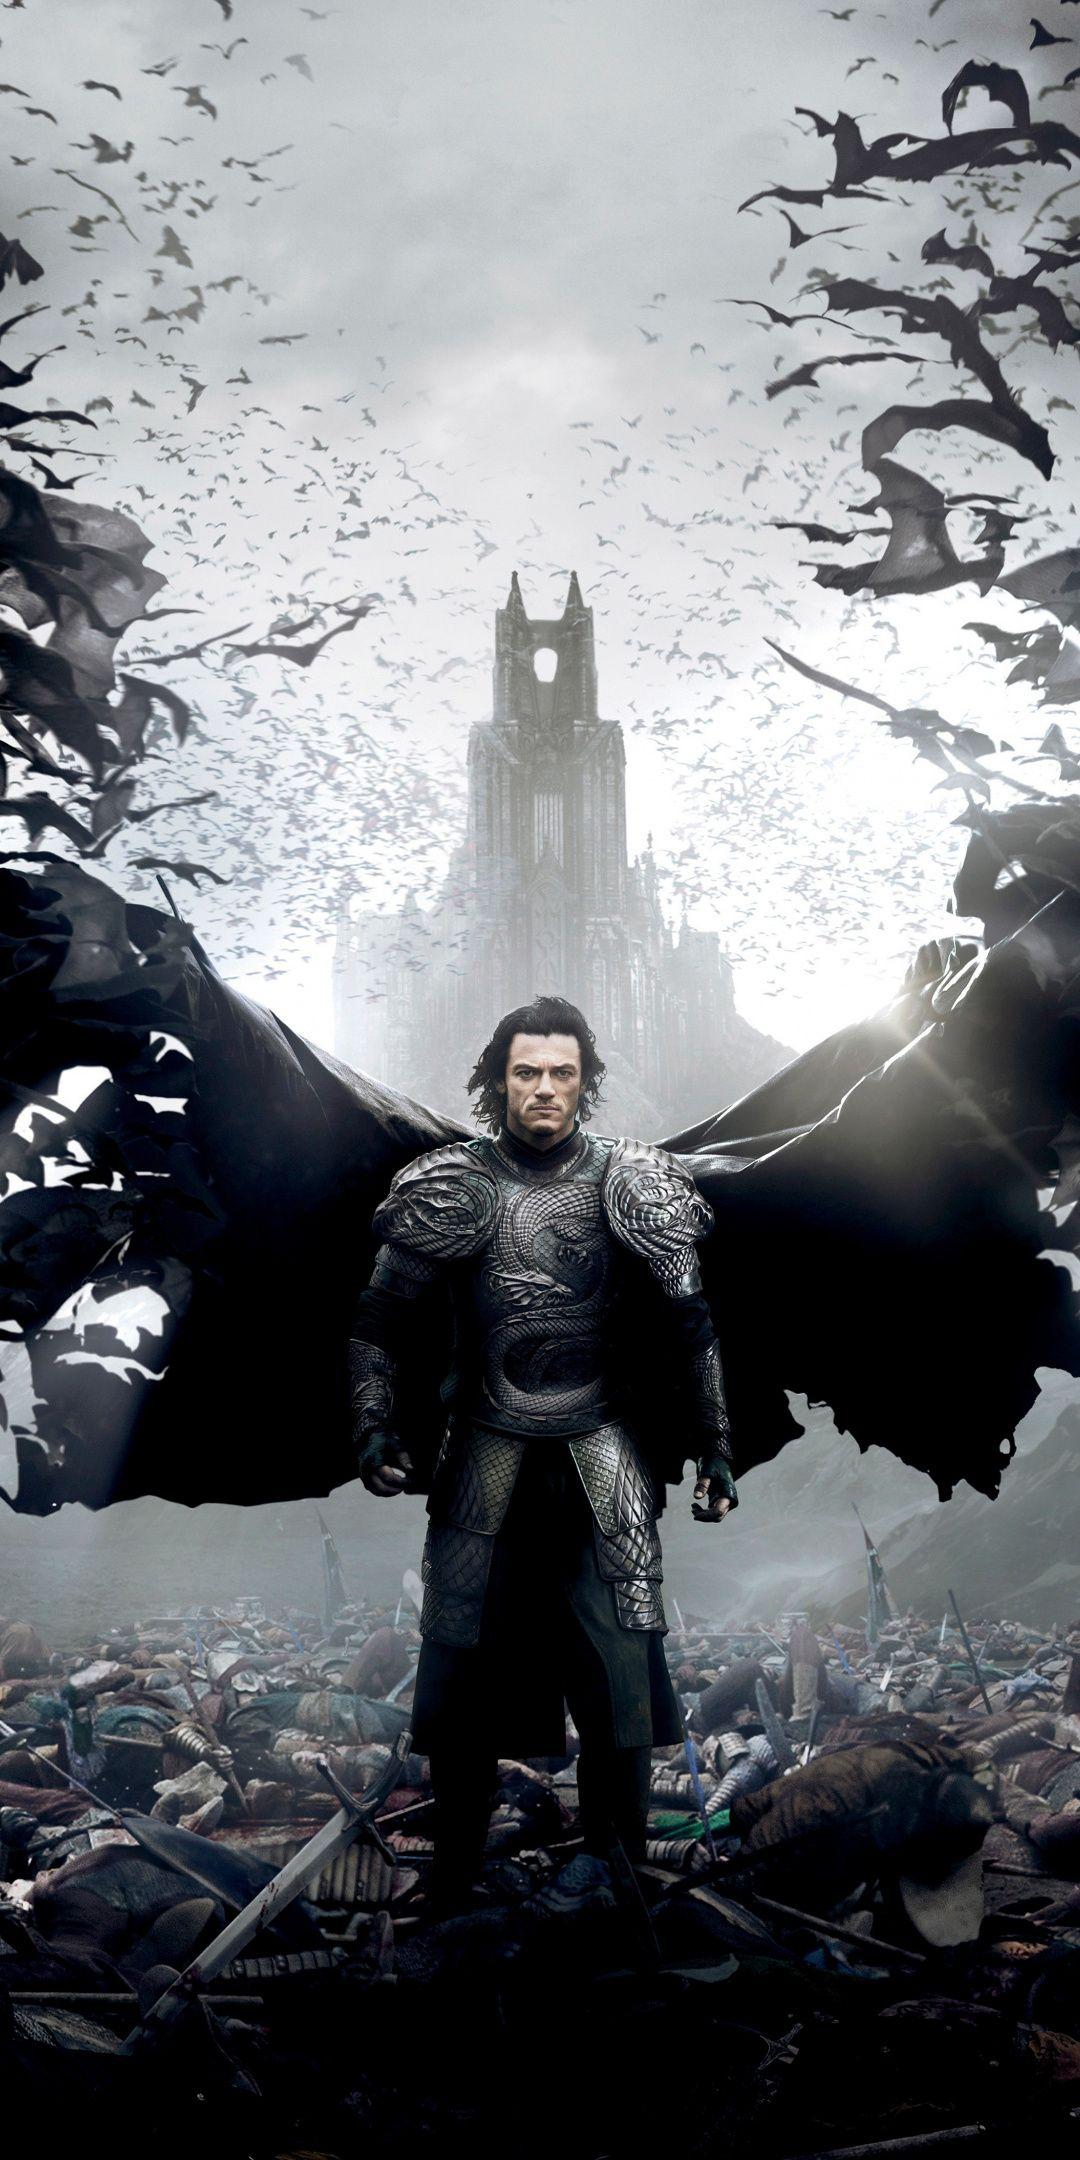 Dracula Untold Luke Evans 2014 Movie Vampire Bats Wallpaper Dracula Untold Dracula Luke Evans